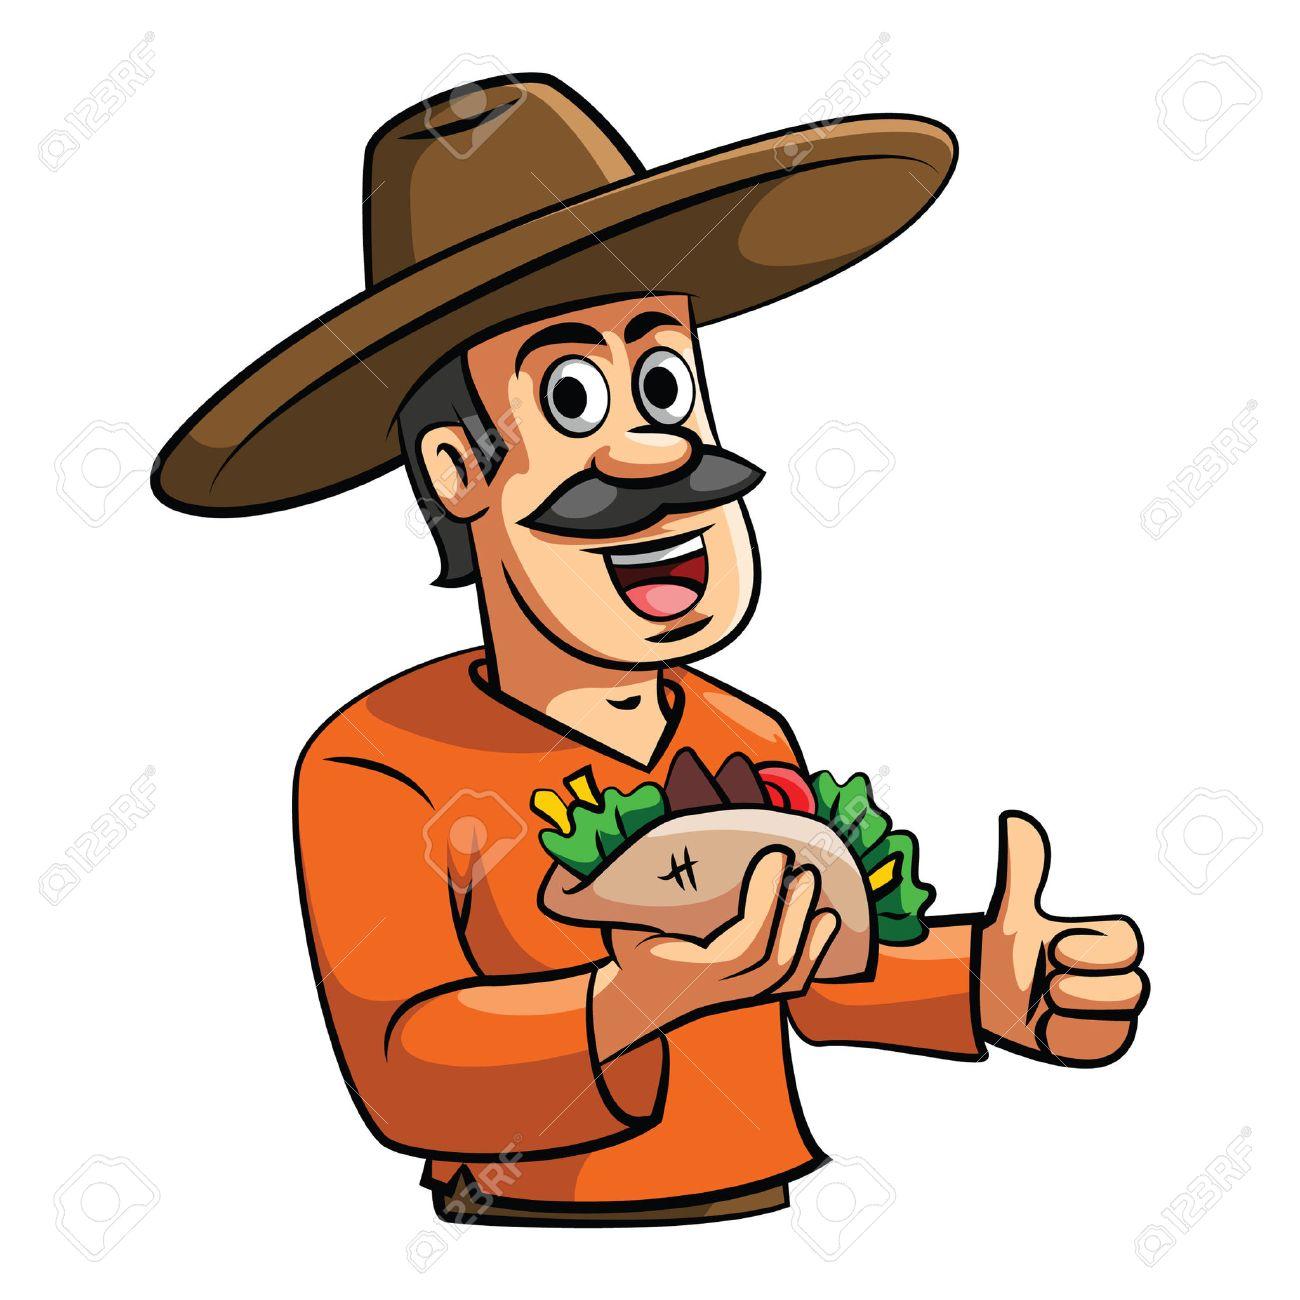 Chef Taco illustration - 37191074